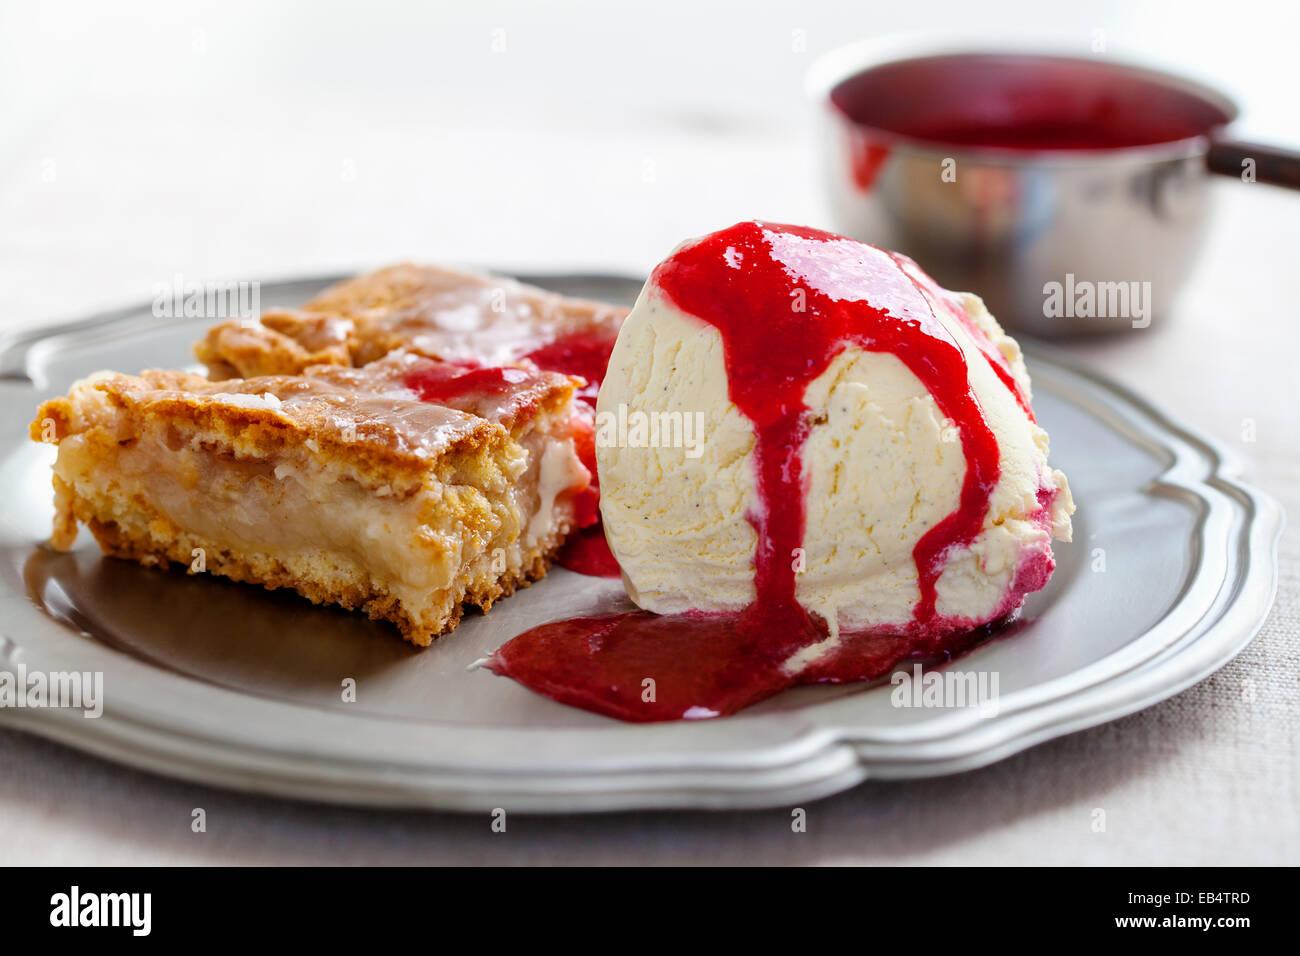 Apple cake with vanilla ice cream and raspberry sauce - Stock Image